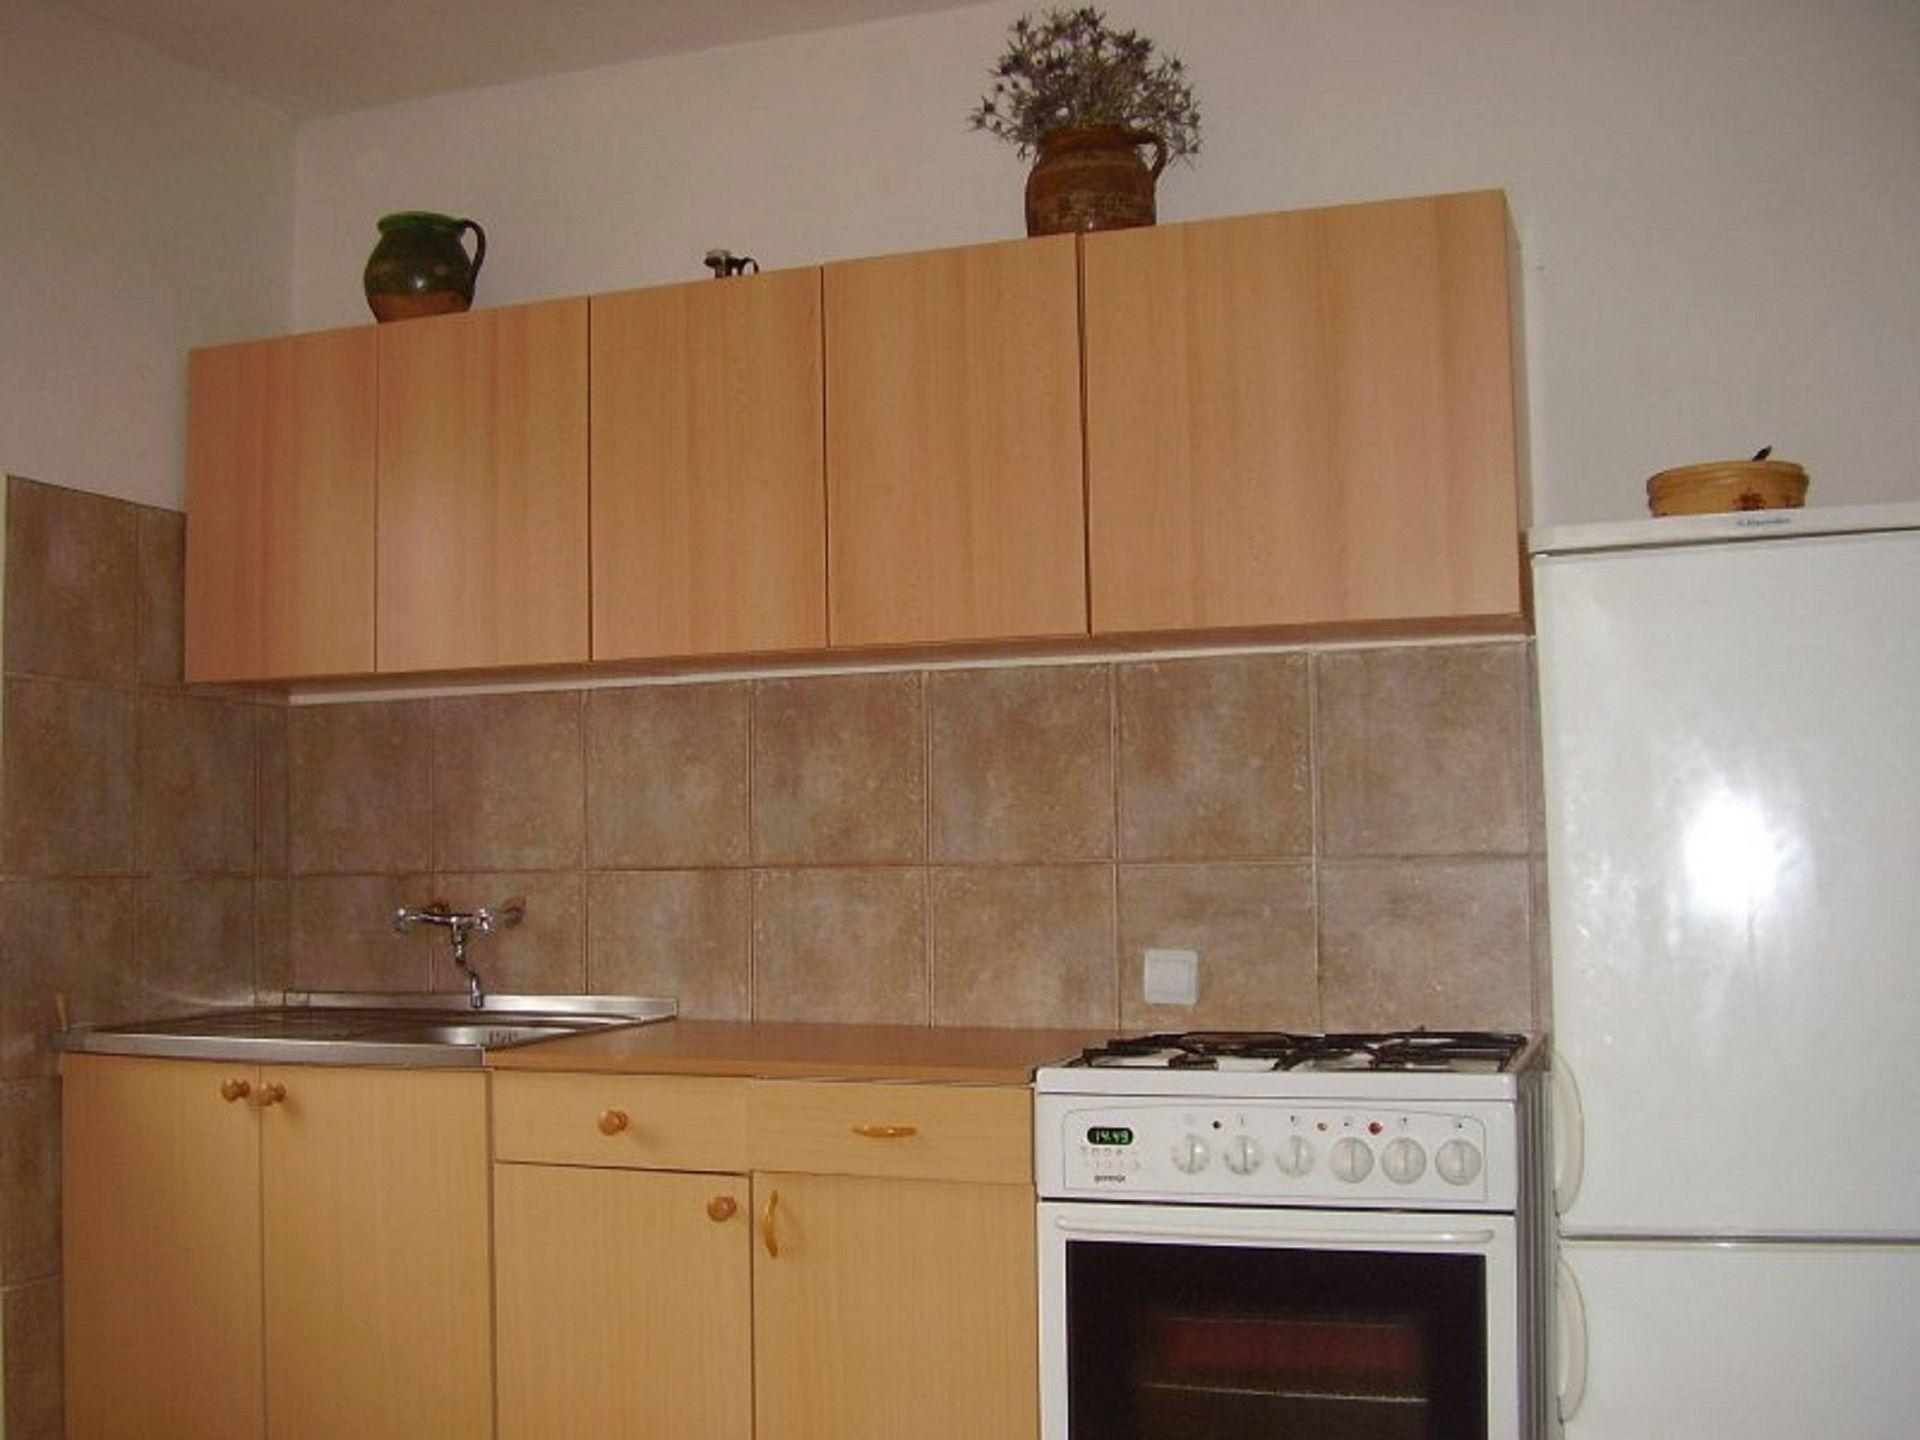 Biserka - Gacka dolina - Maisons de repos, villas Croatie - H(4+2): cuisine